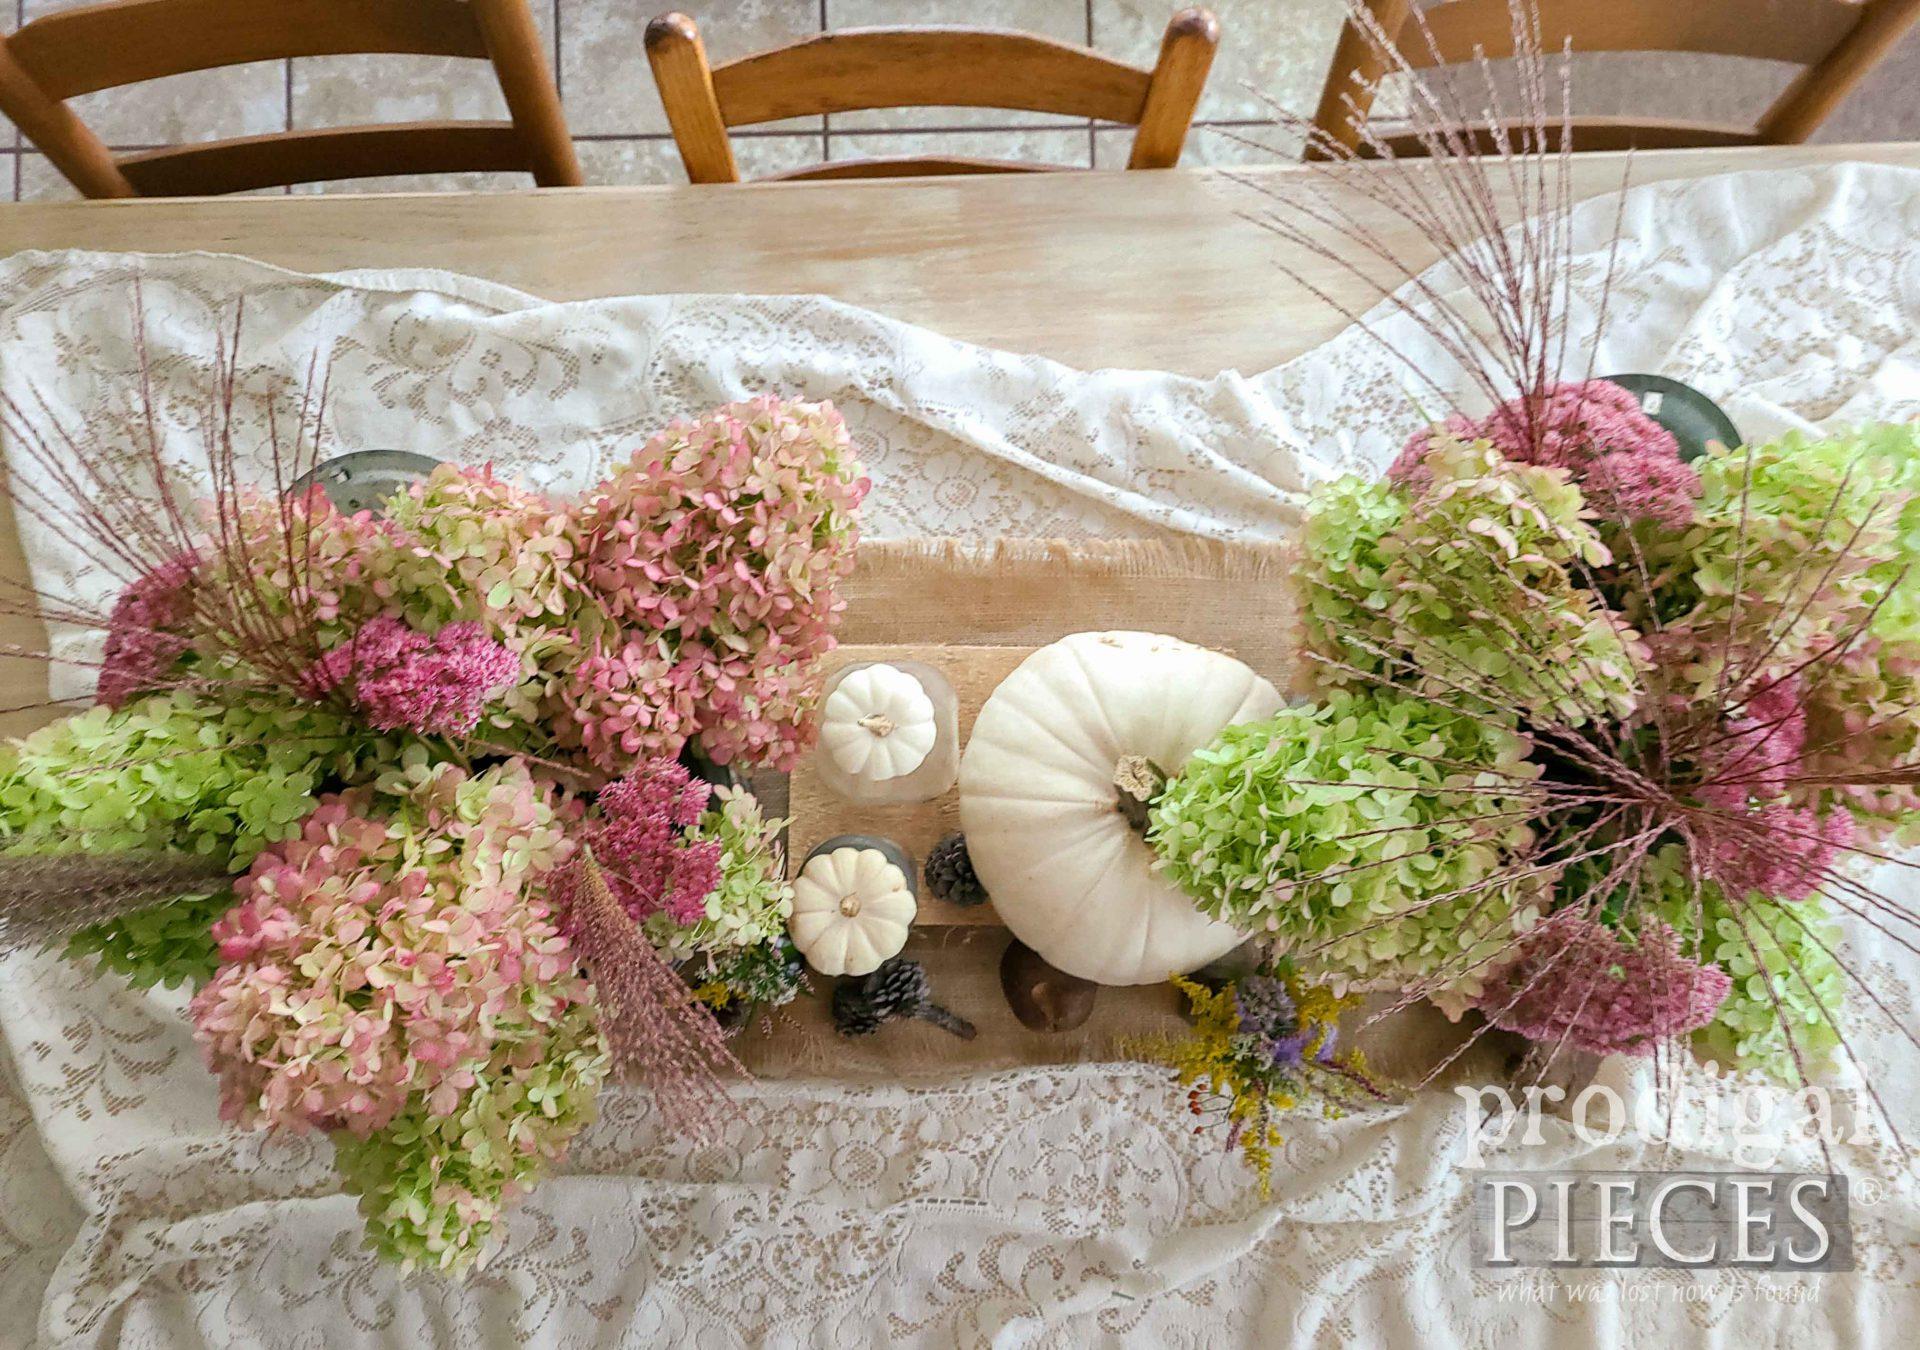 Table Top Fall Farmhouse Tablescape by Larissa of Prodigal Pieces | prodigalpieces.com #prodigalpieces #farmhouse #fall #autumn #diy #homedecor